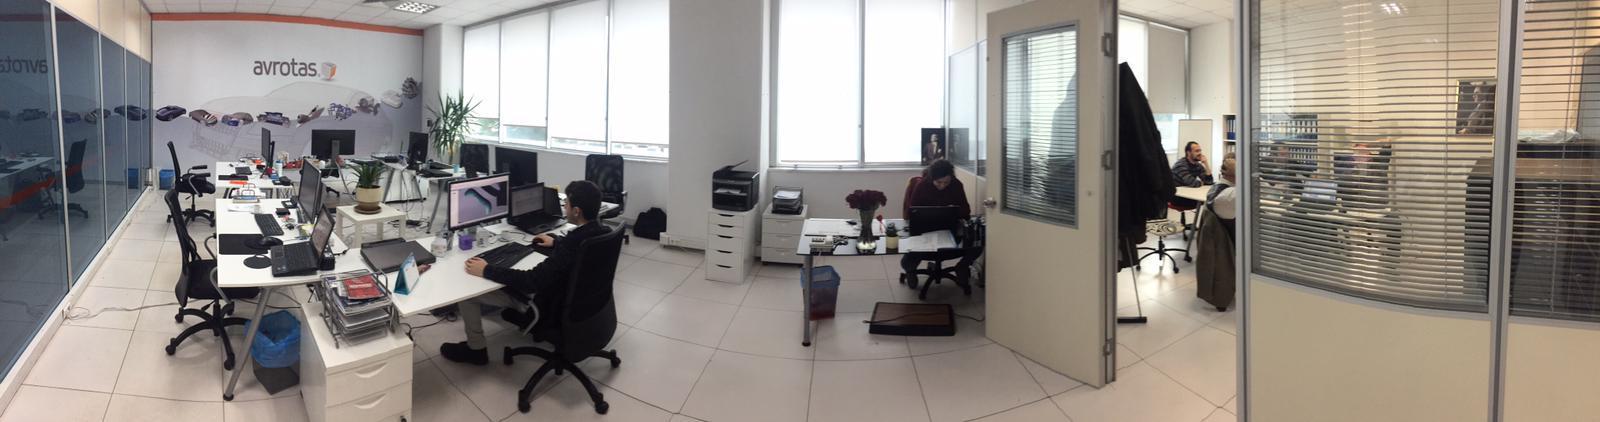 AVROTAS Ofis